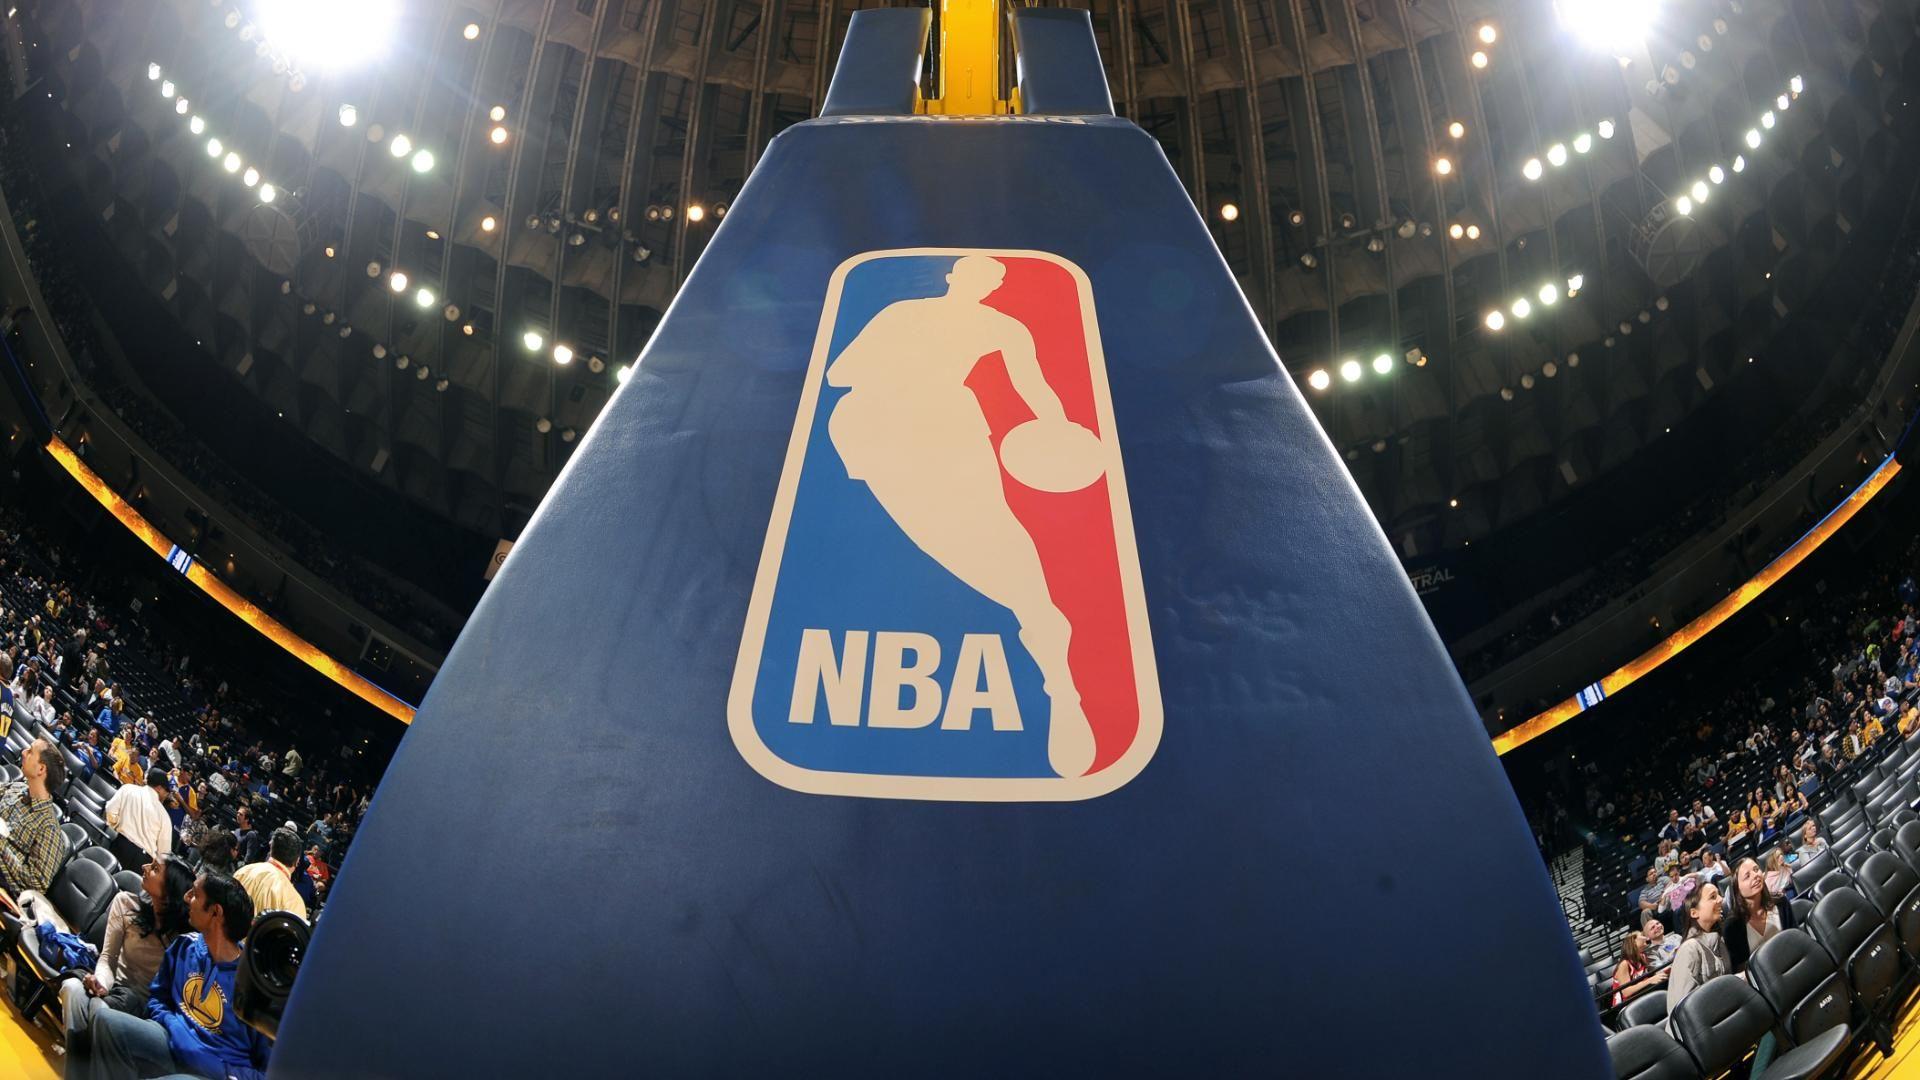 NBA Going to Cuba Got Miami Heated